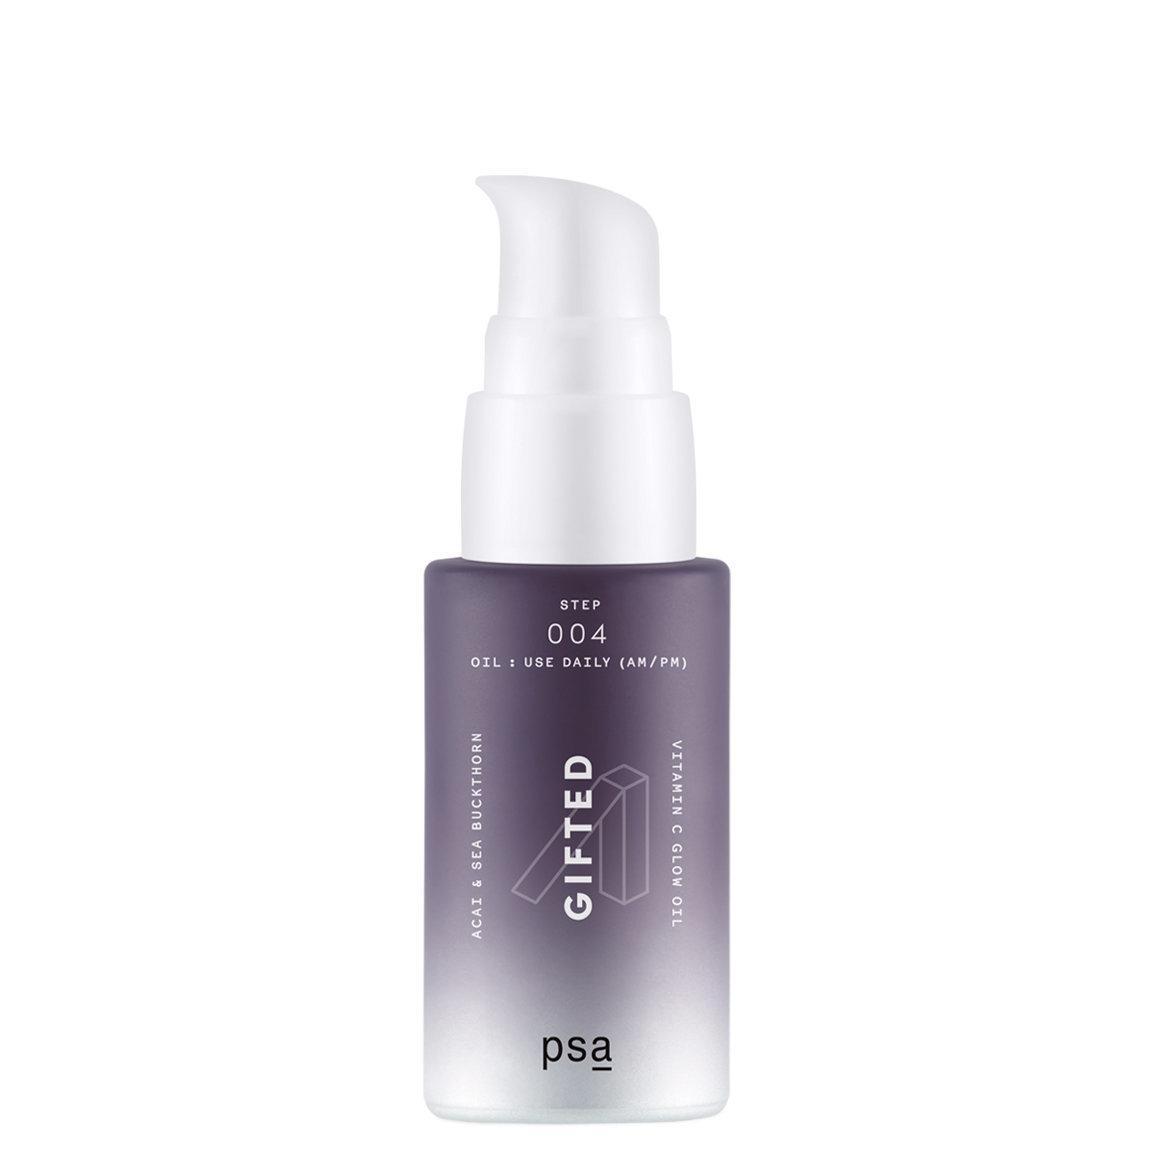 PSA Skin Gifted Acai & Sea Buckthorn Vitamin C Glow Oil alternative view 1 - product swatch.